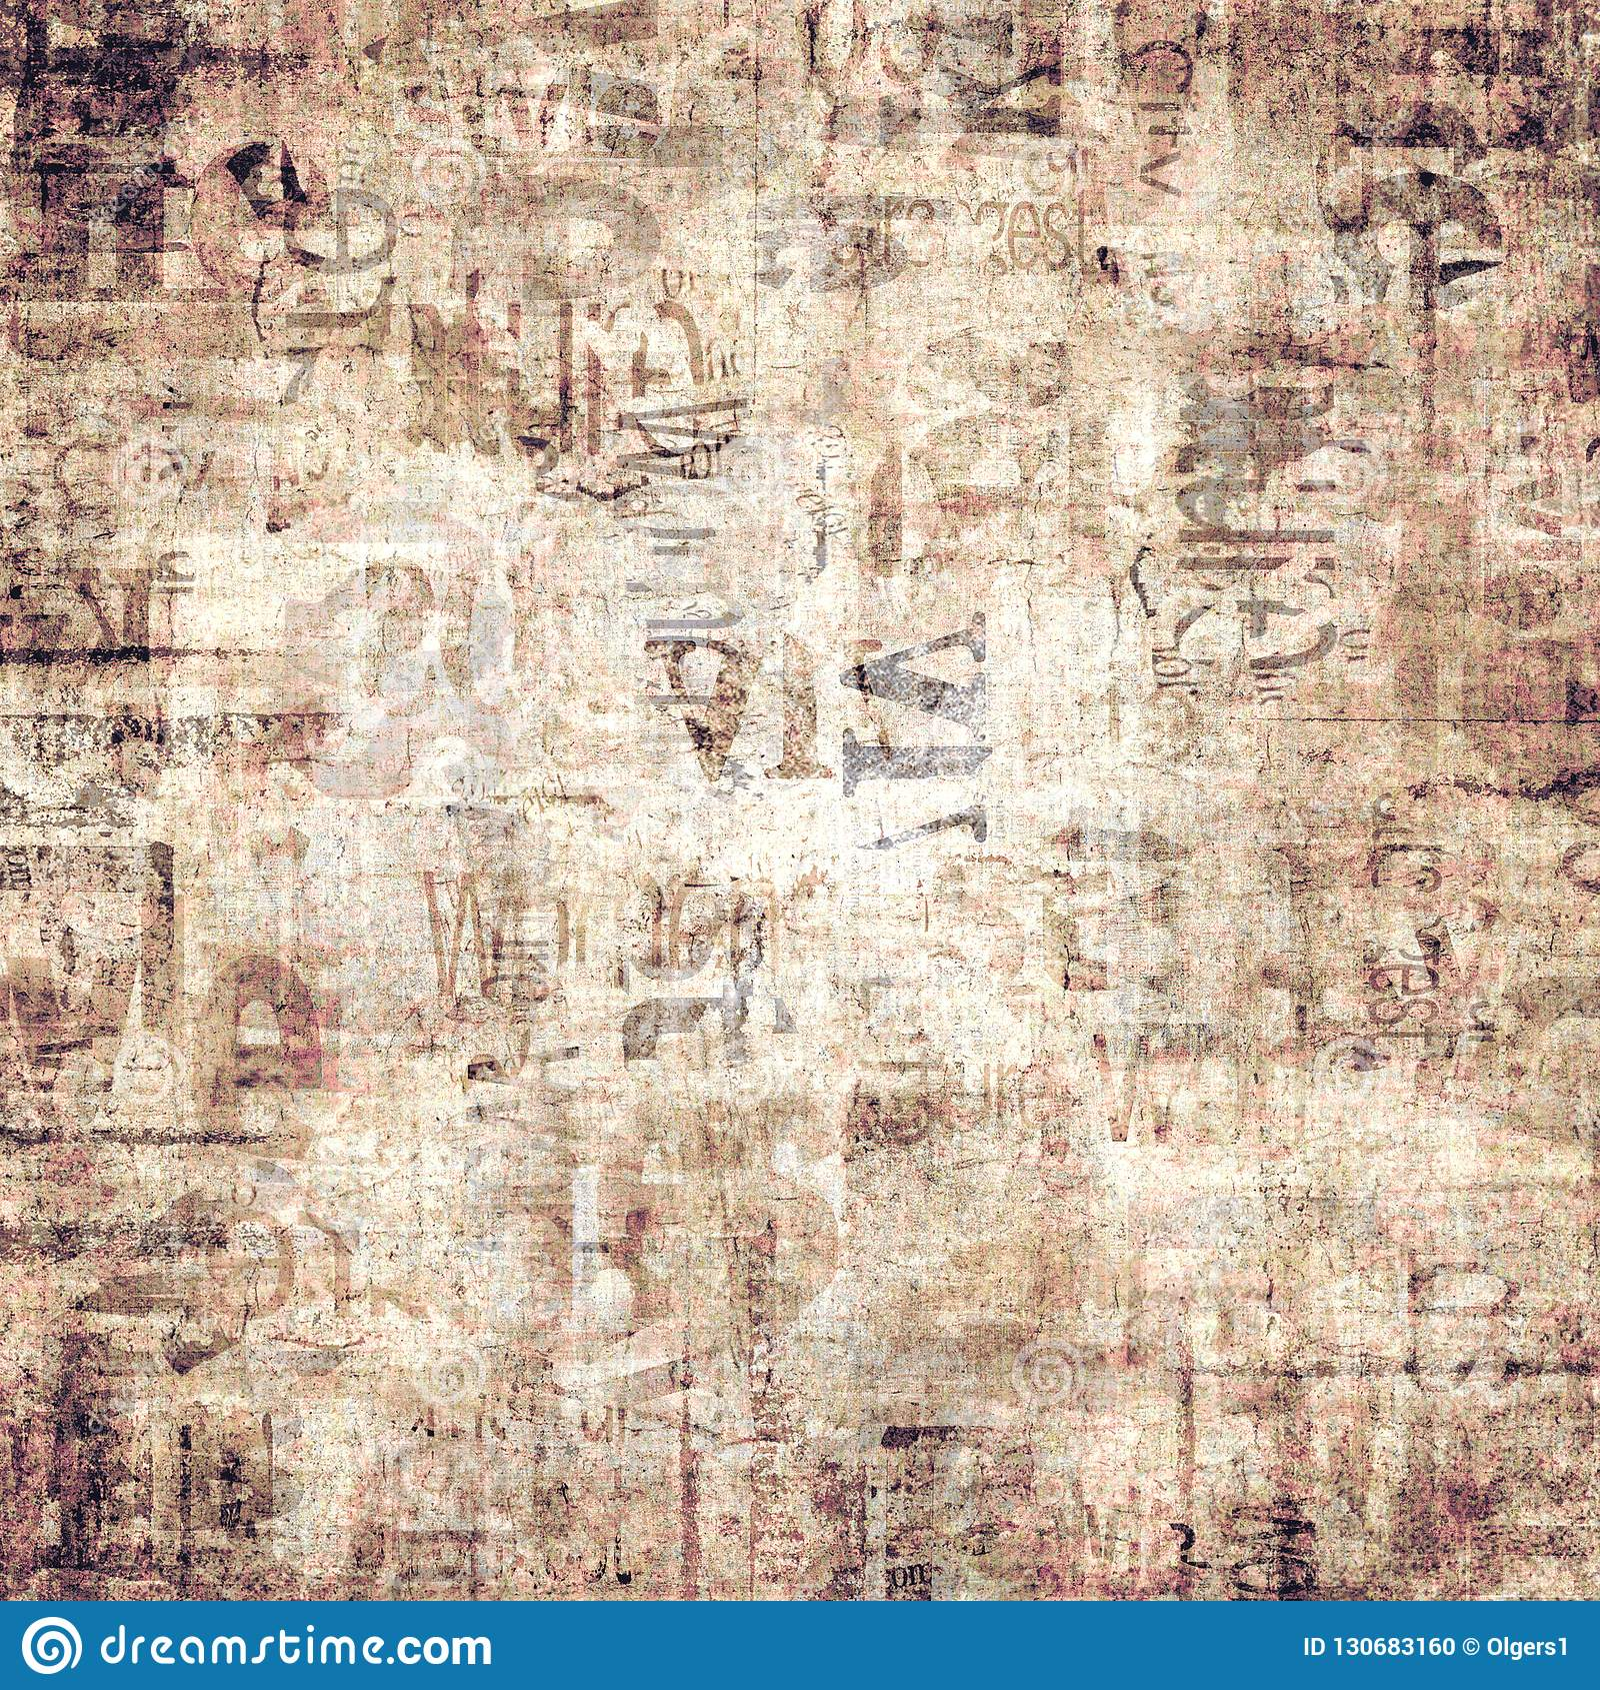 Old Vintage Grunge Newspaper Paper Texture Background Stock